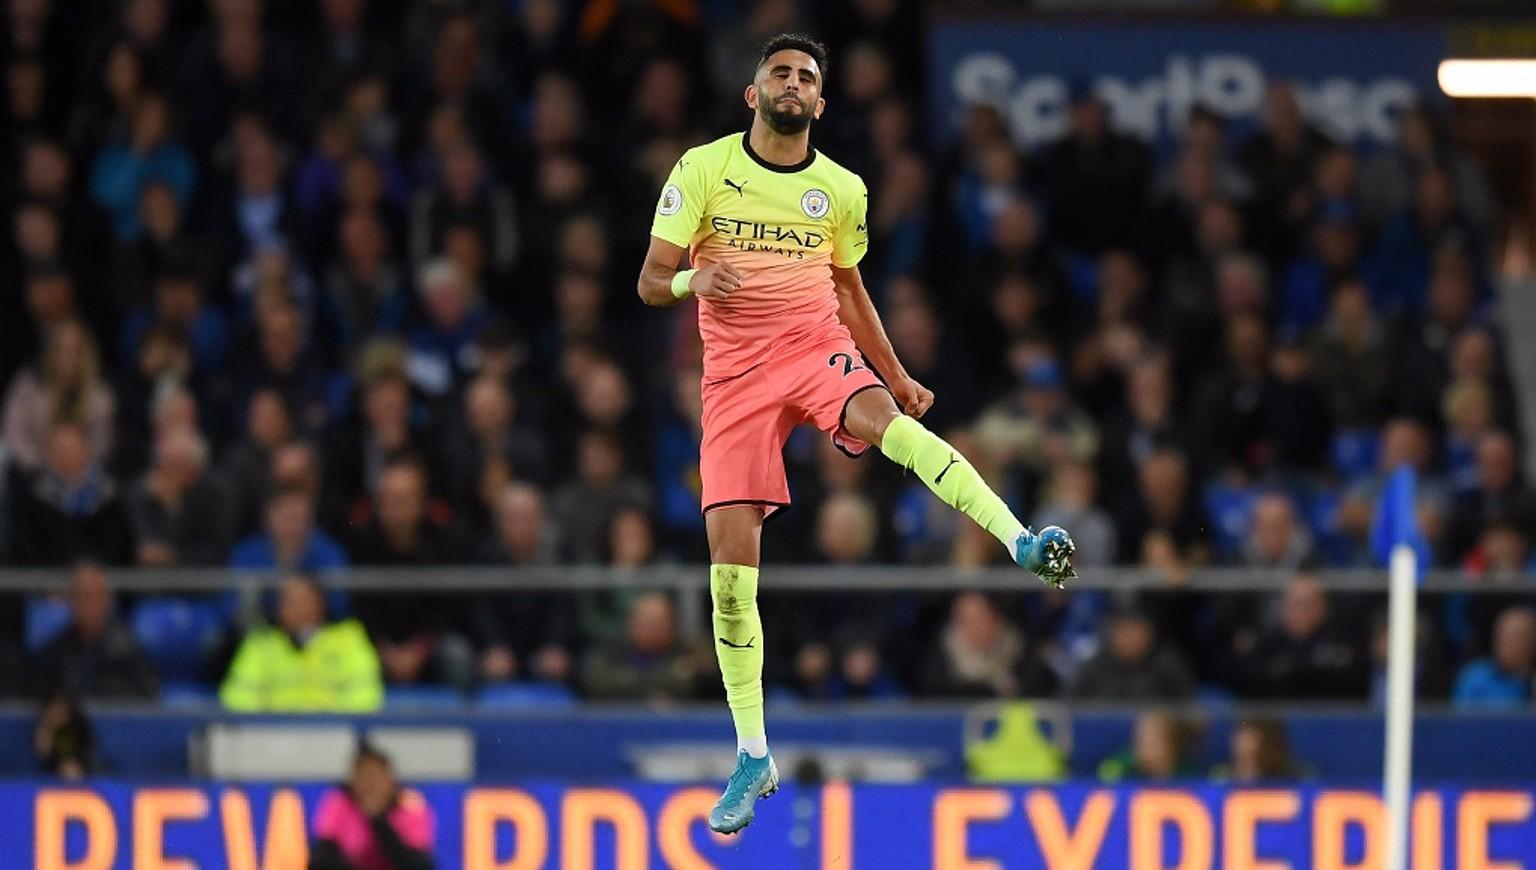 GOAL! Star man Riyad Mahrez puts the Blues ahead